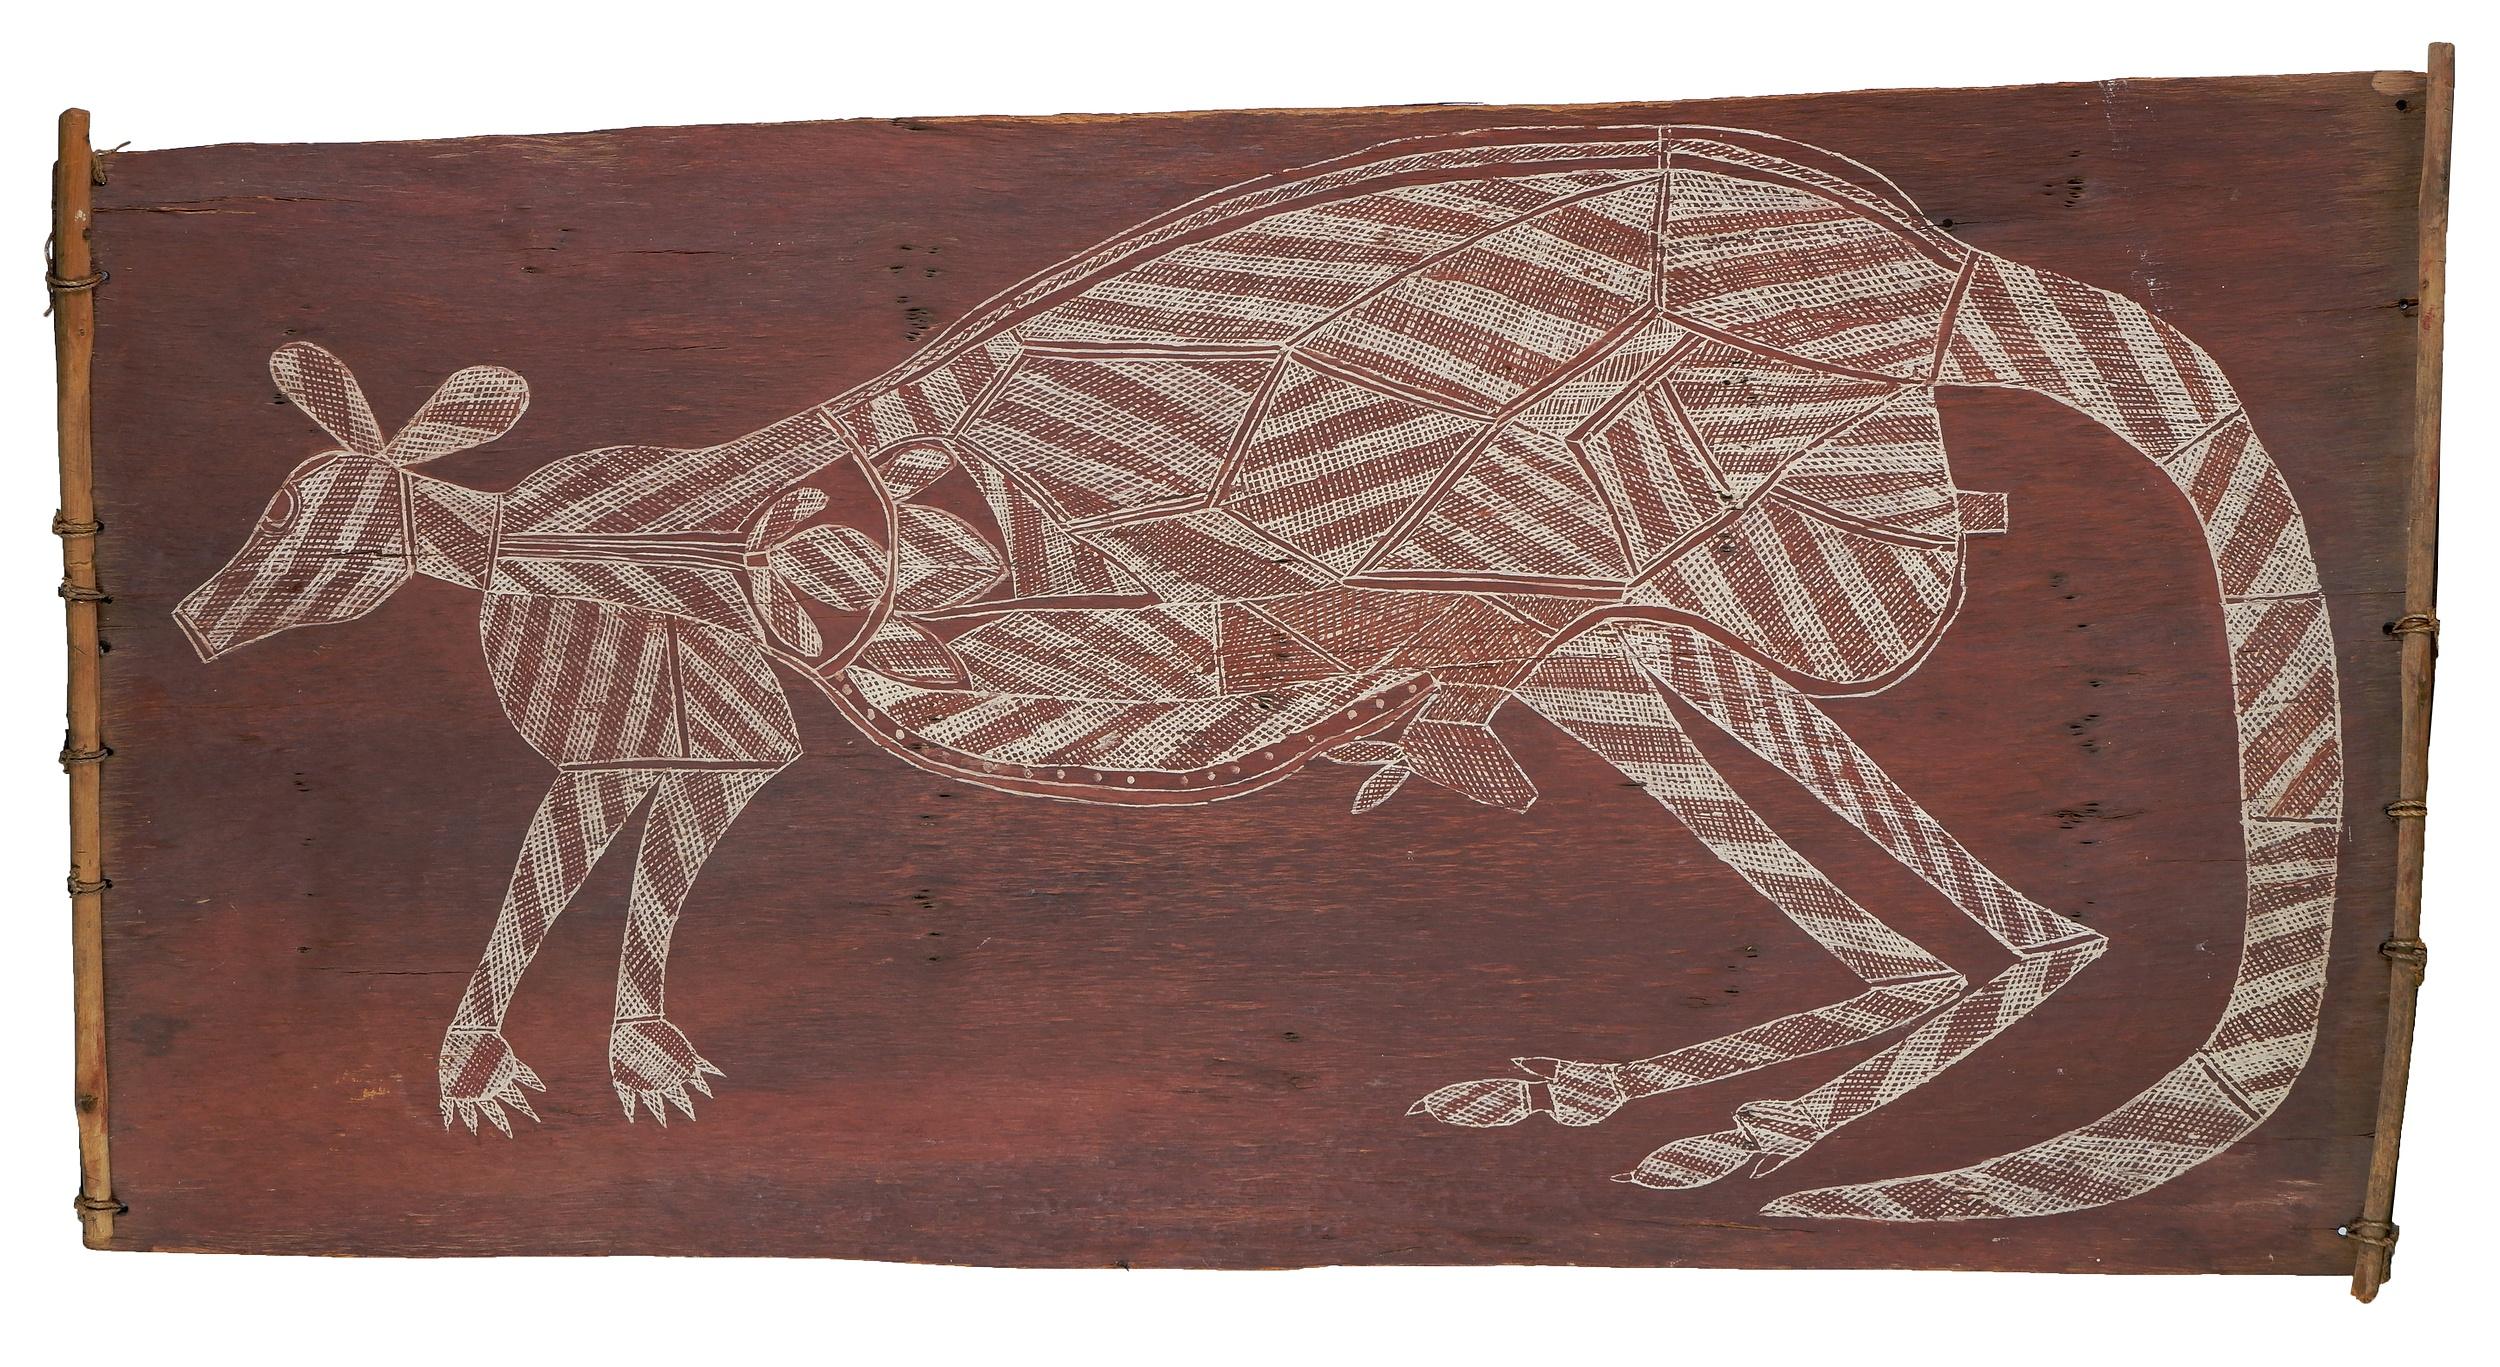 'Bobby Barrdjaray Nganjmira (1915-1992, Kunwinjku language group), Kangaroo, Natural Earth Pigments on Eucalyptus Bark, 102 x 51 cm'